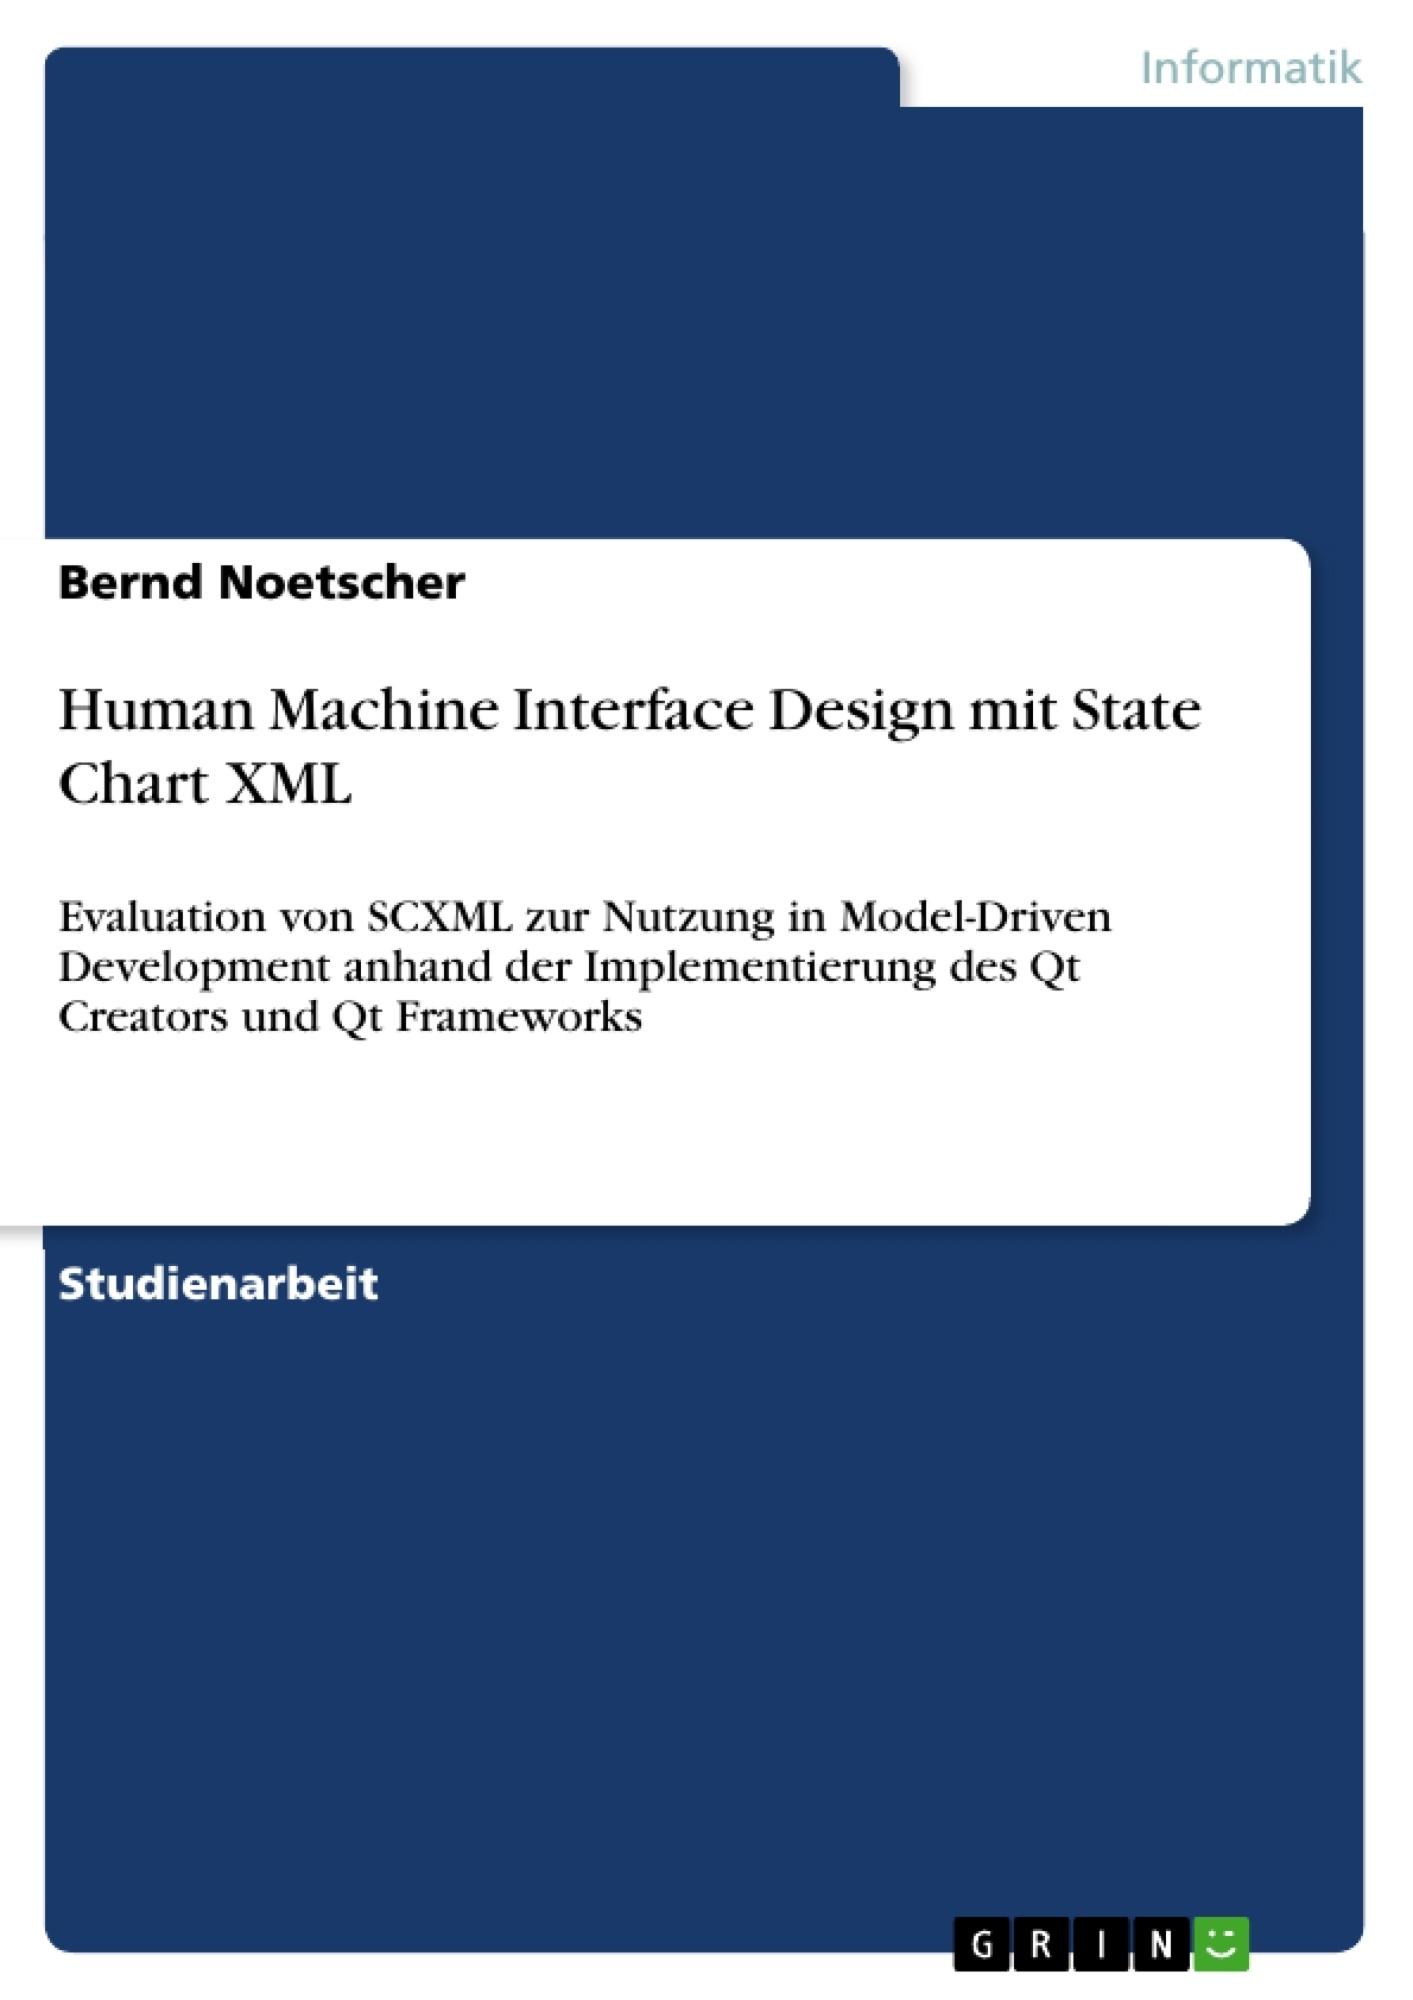 Titel: Human Machine Interface Design mit State Chart XML